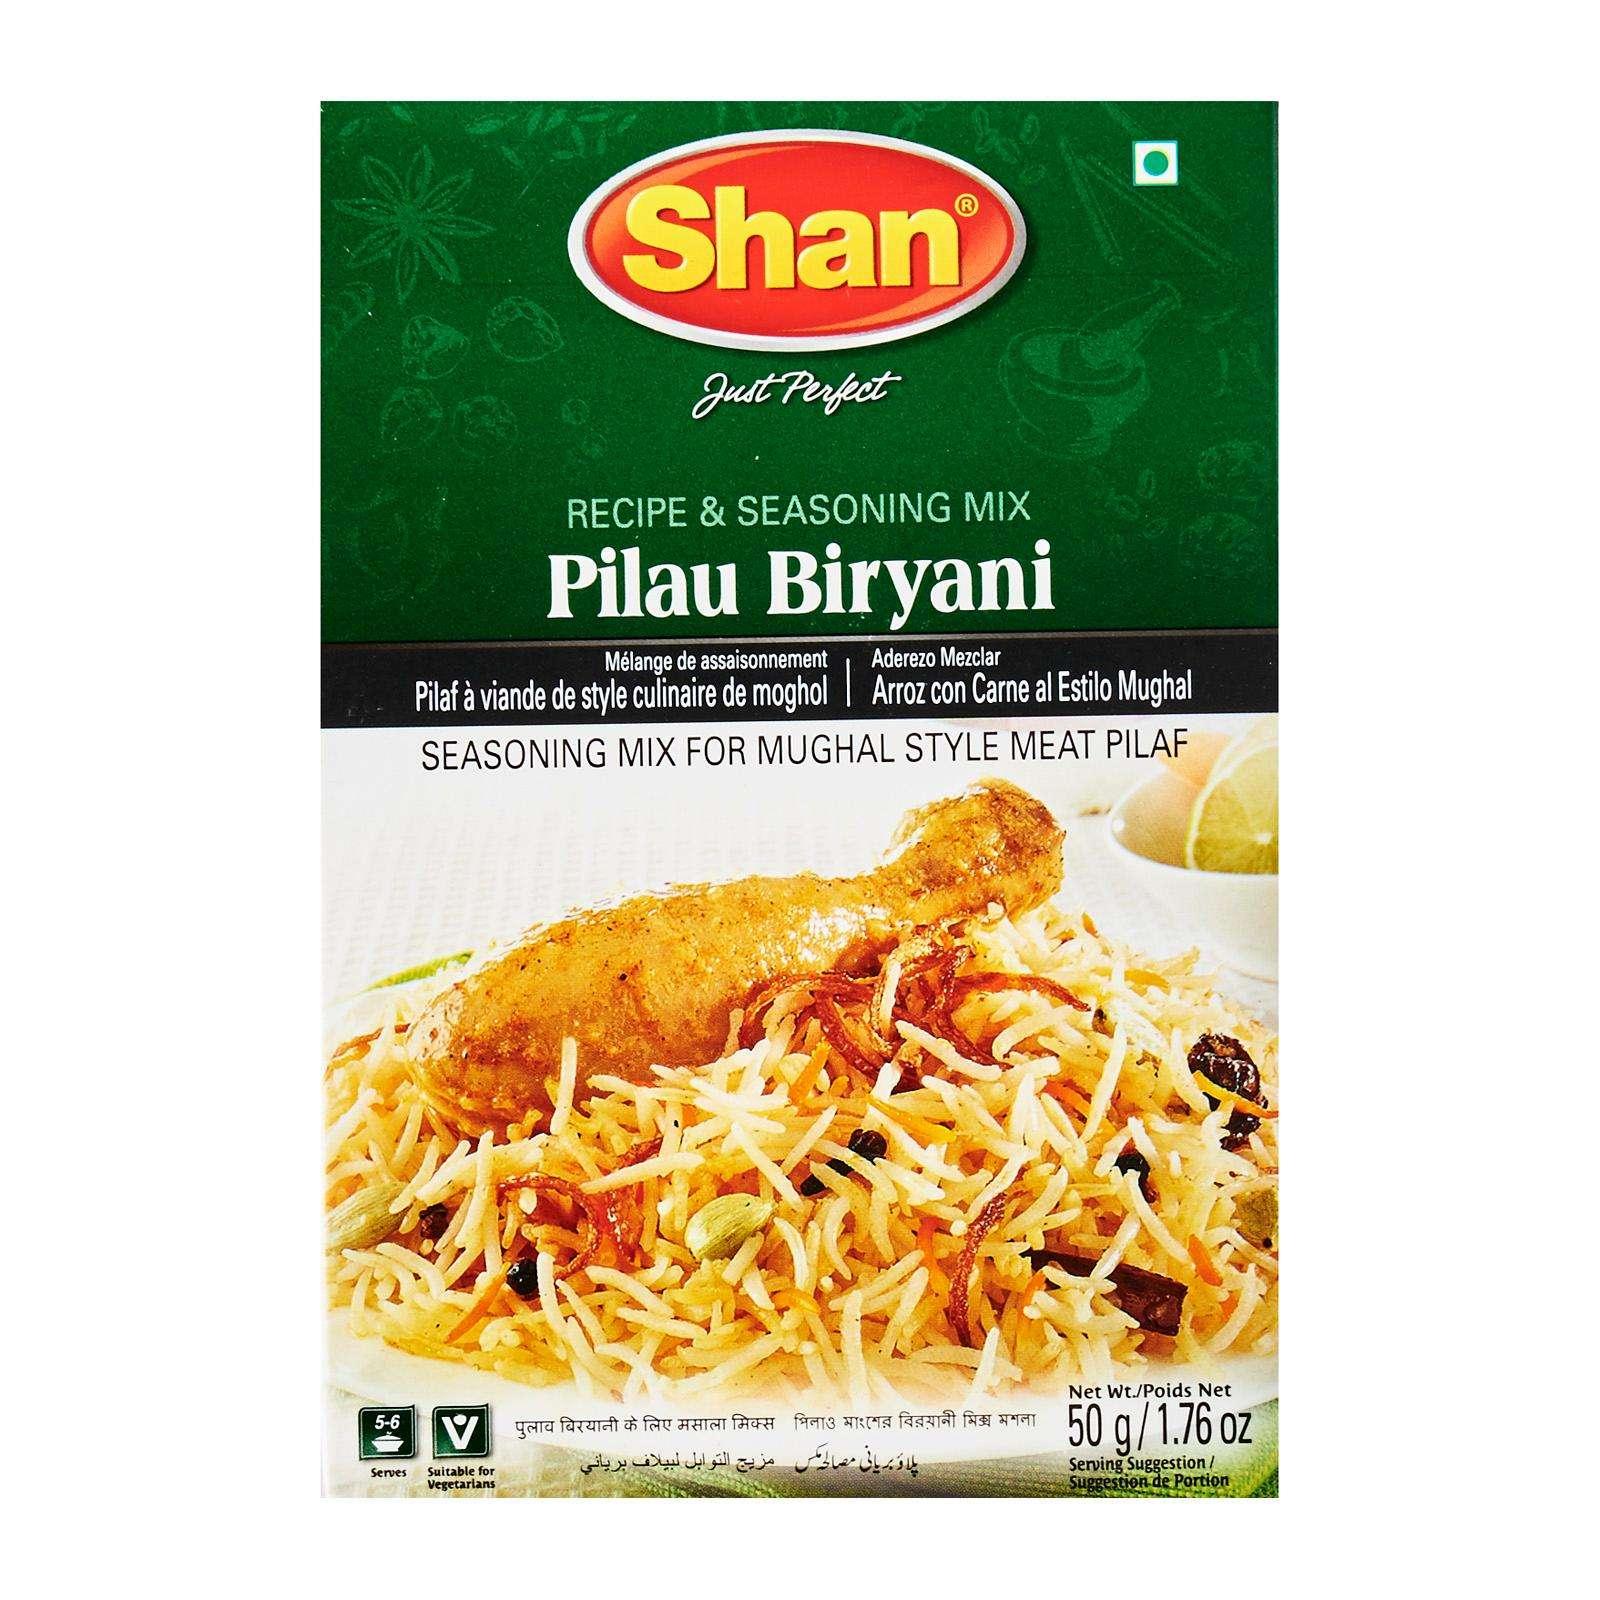 Tasty Shan Pulau Briyani Mix 50g Spices And Seasonings Wholesale 36 Months Shelf Life